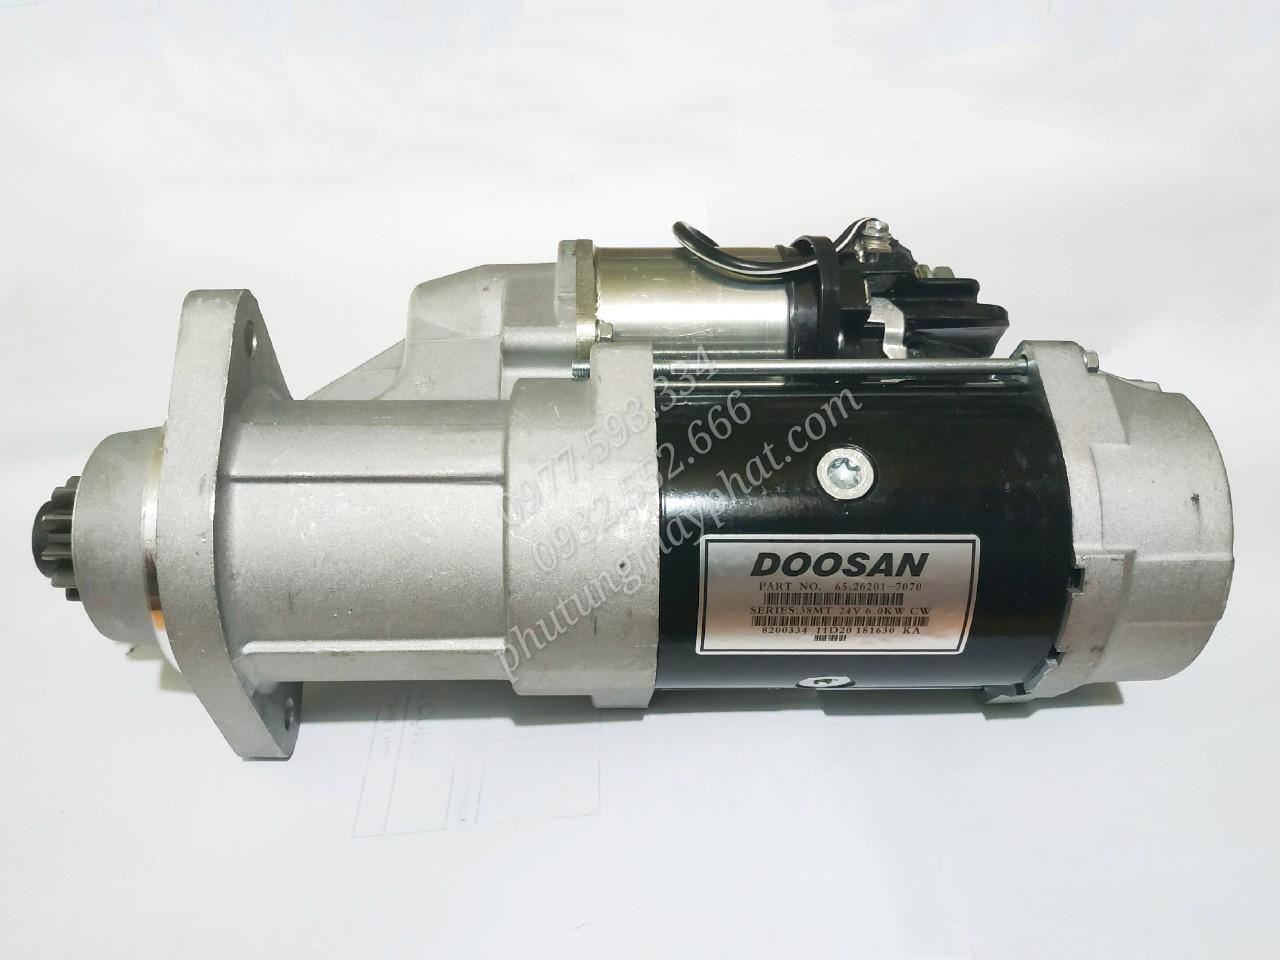 Doosan 65.26201-7070 class=